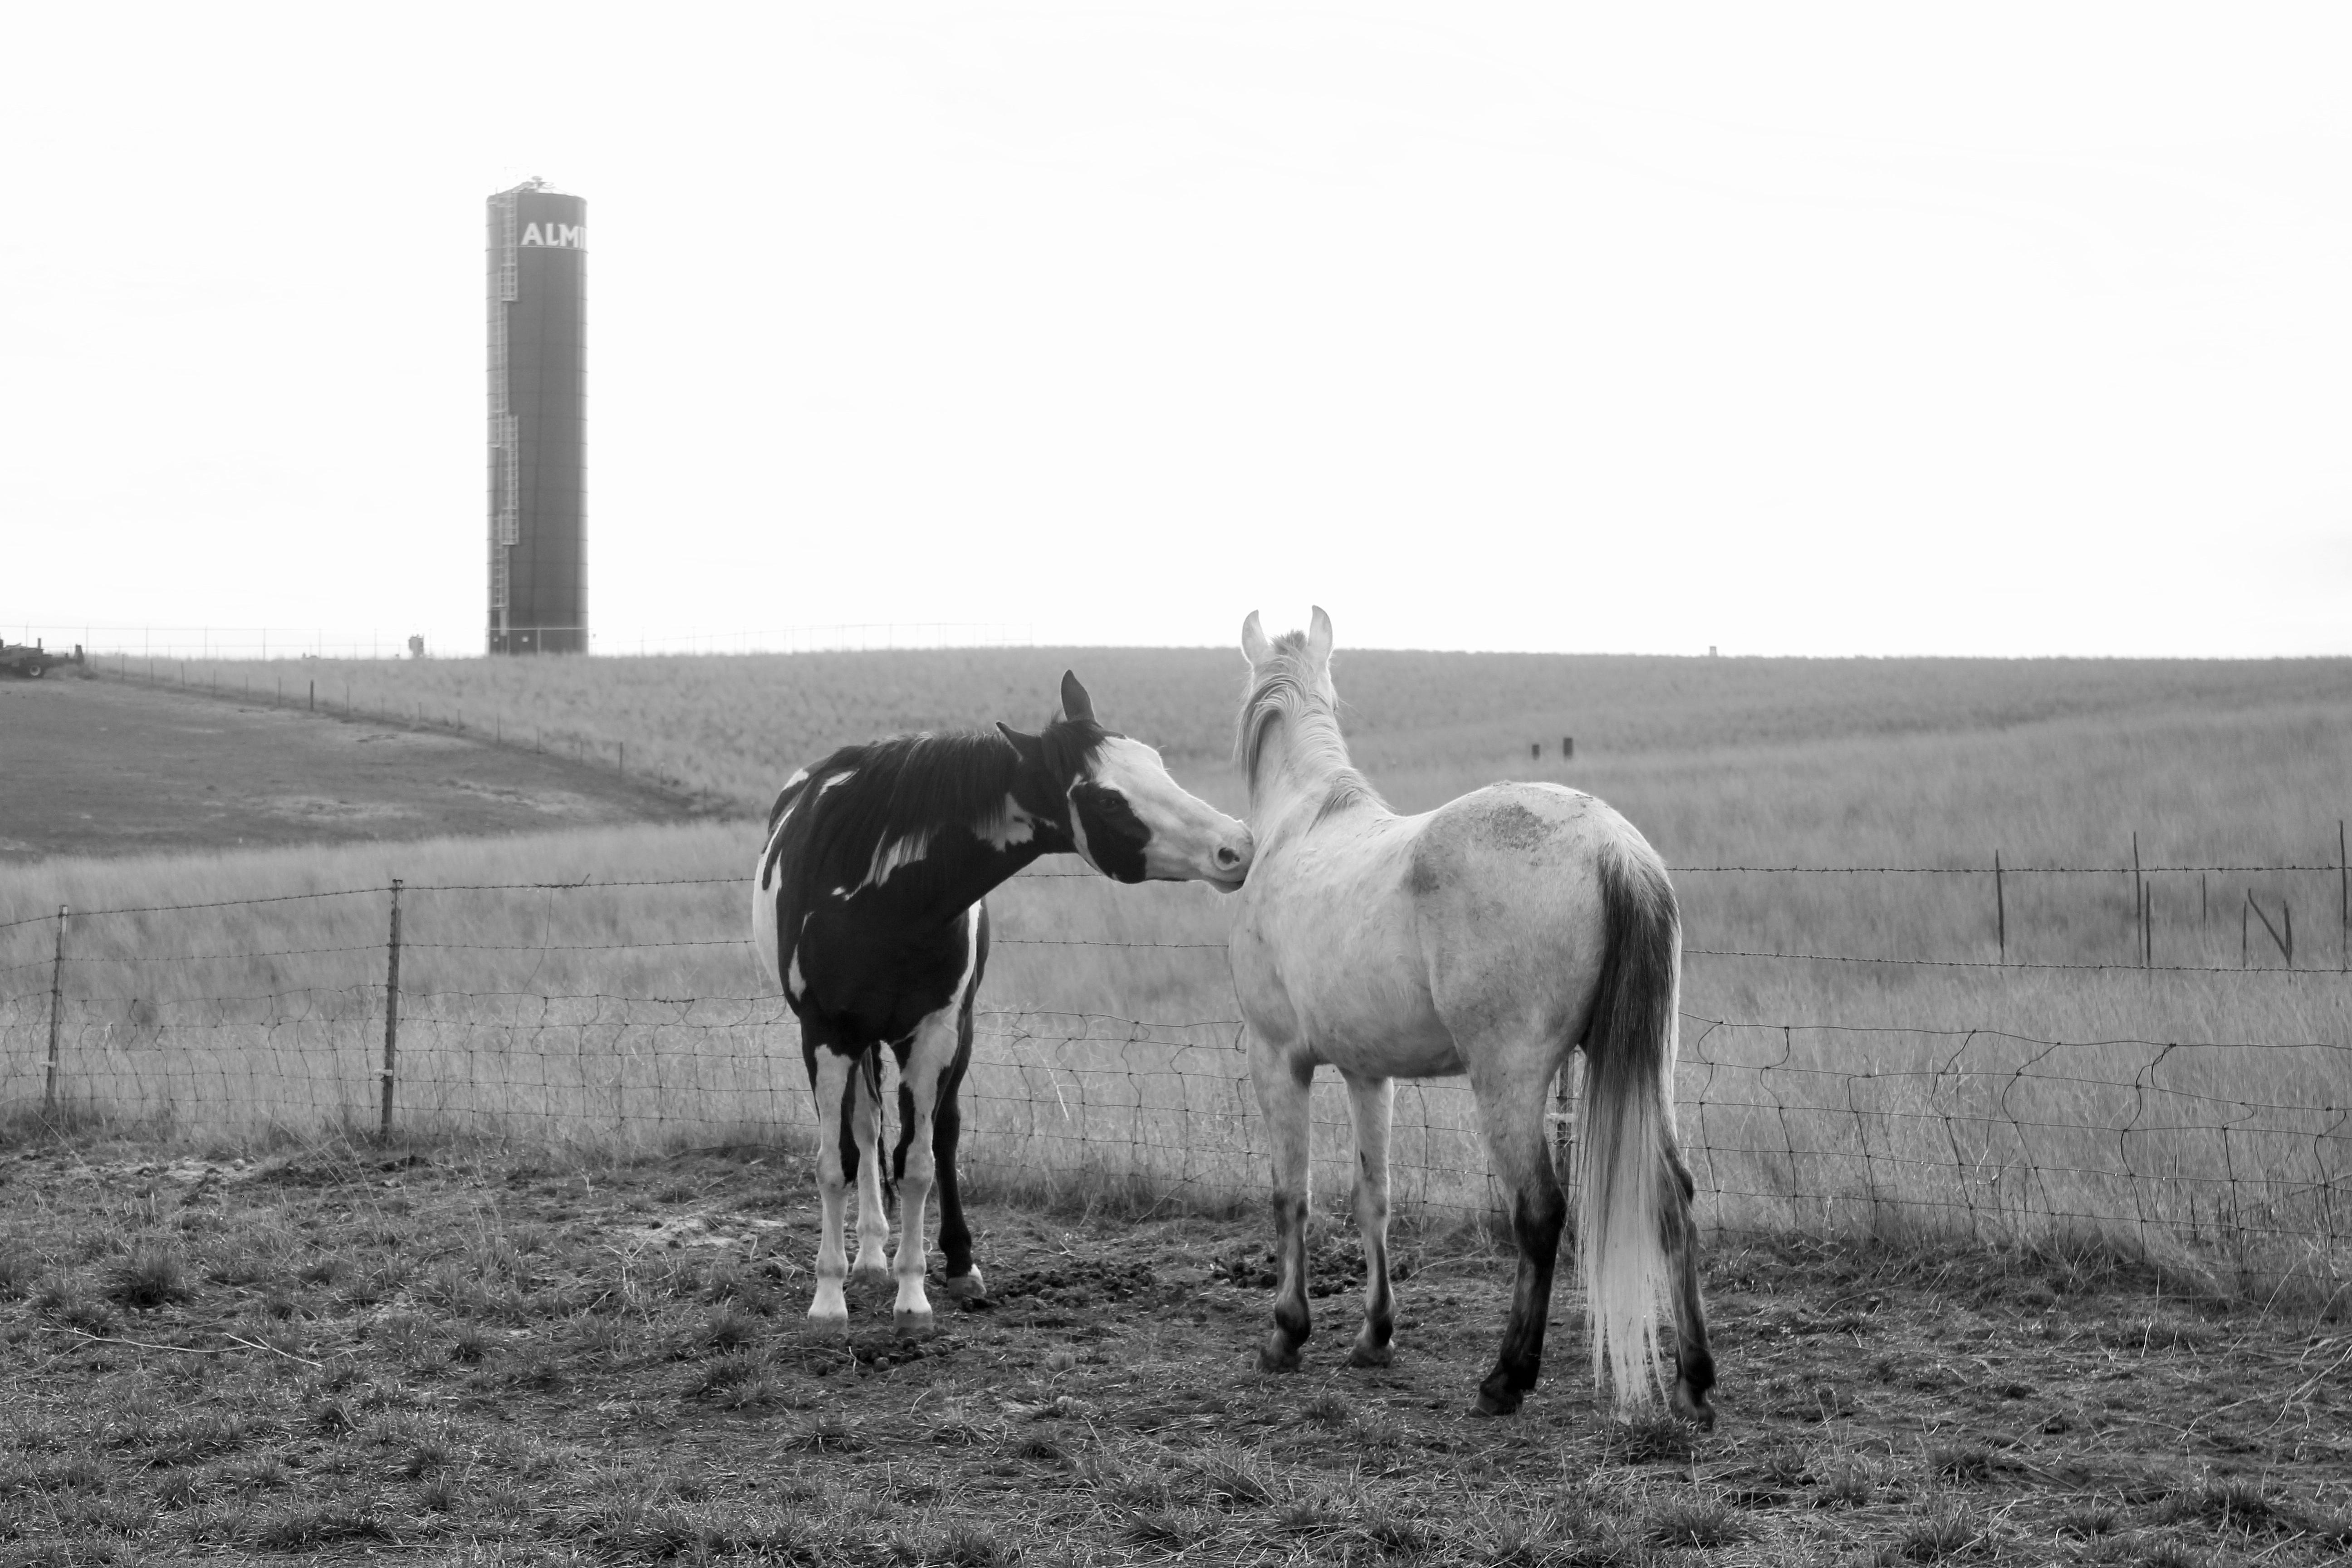 Paint horse dreamin